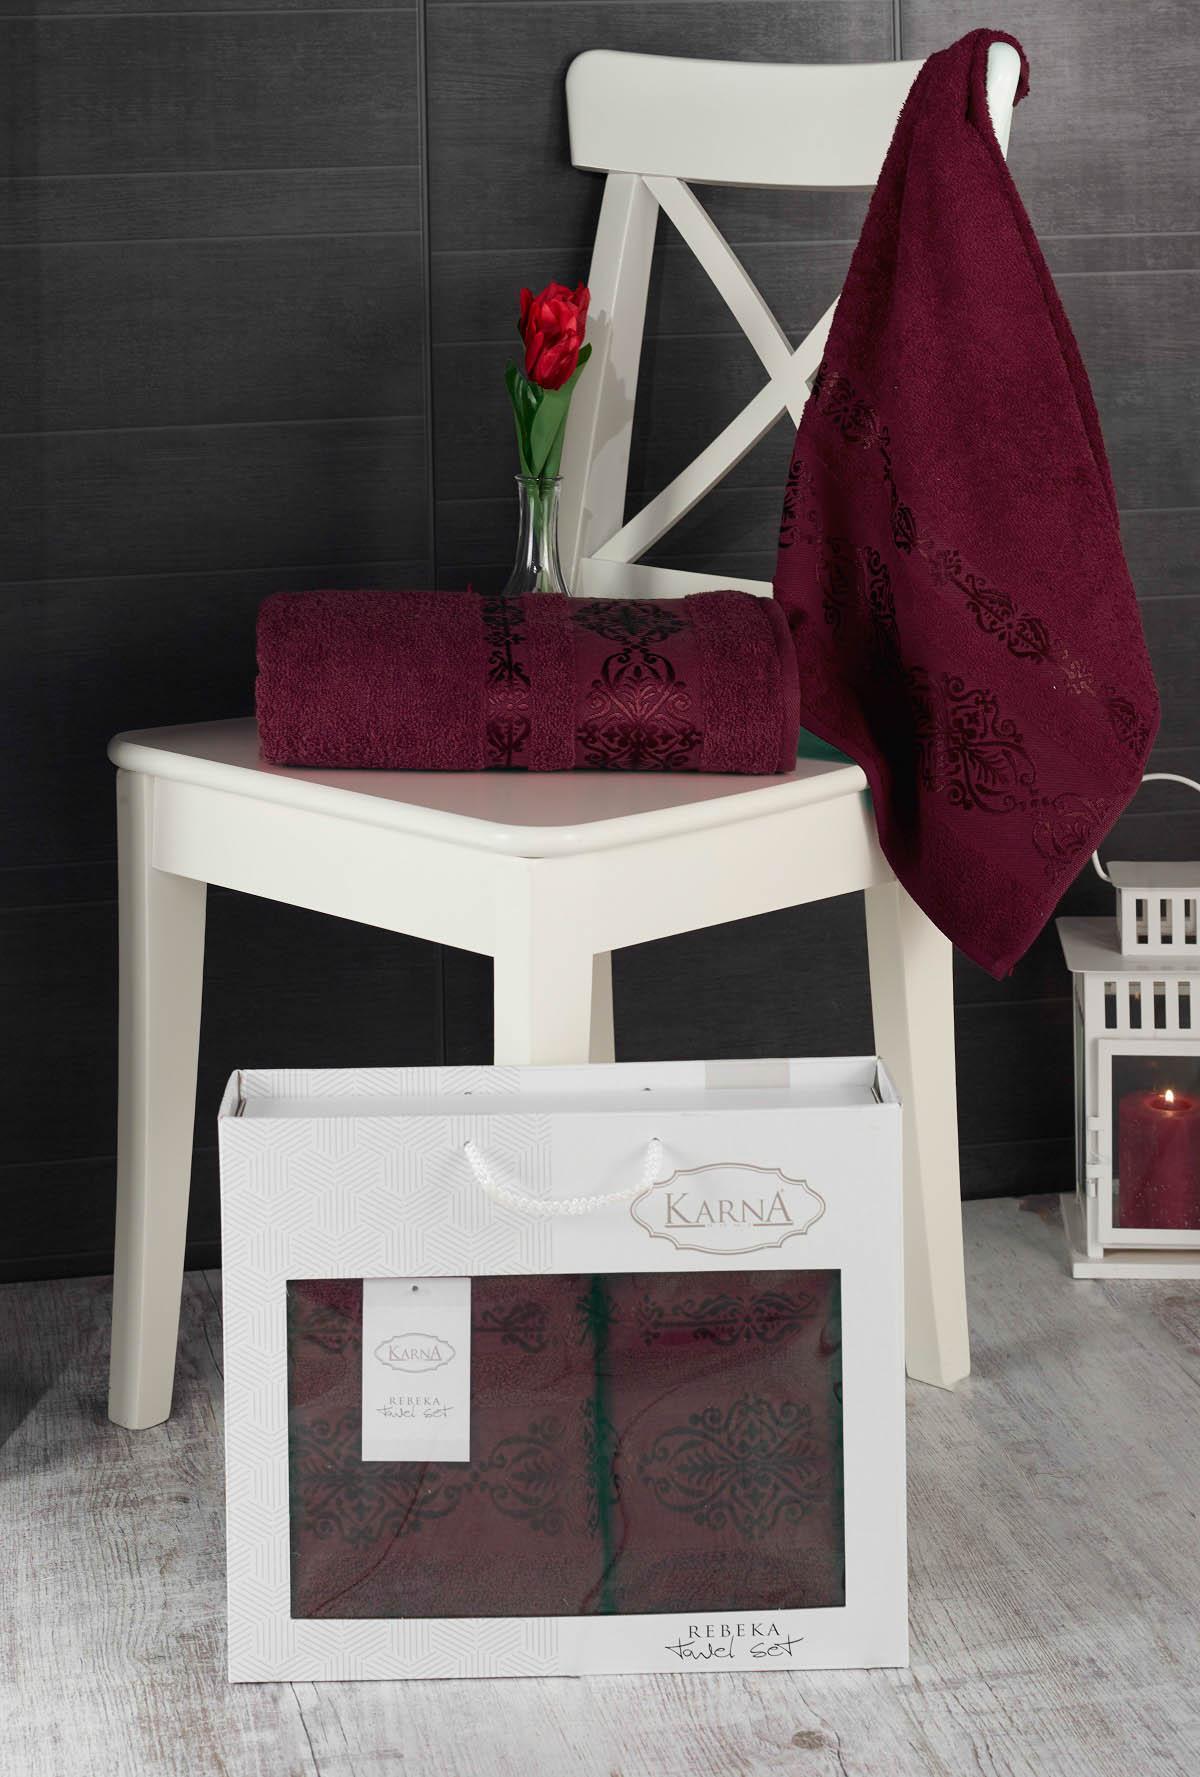 Полотенца Karna Полотенце Rebeca Цвет: Бордовый (50х90 см,70х140 см) цены онлайн